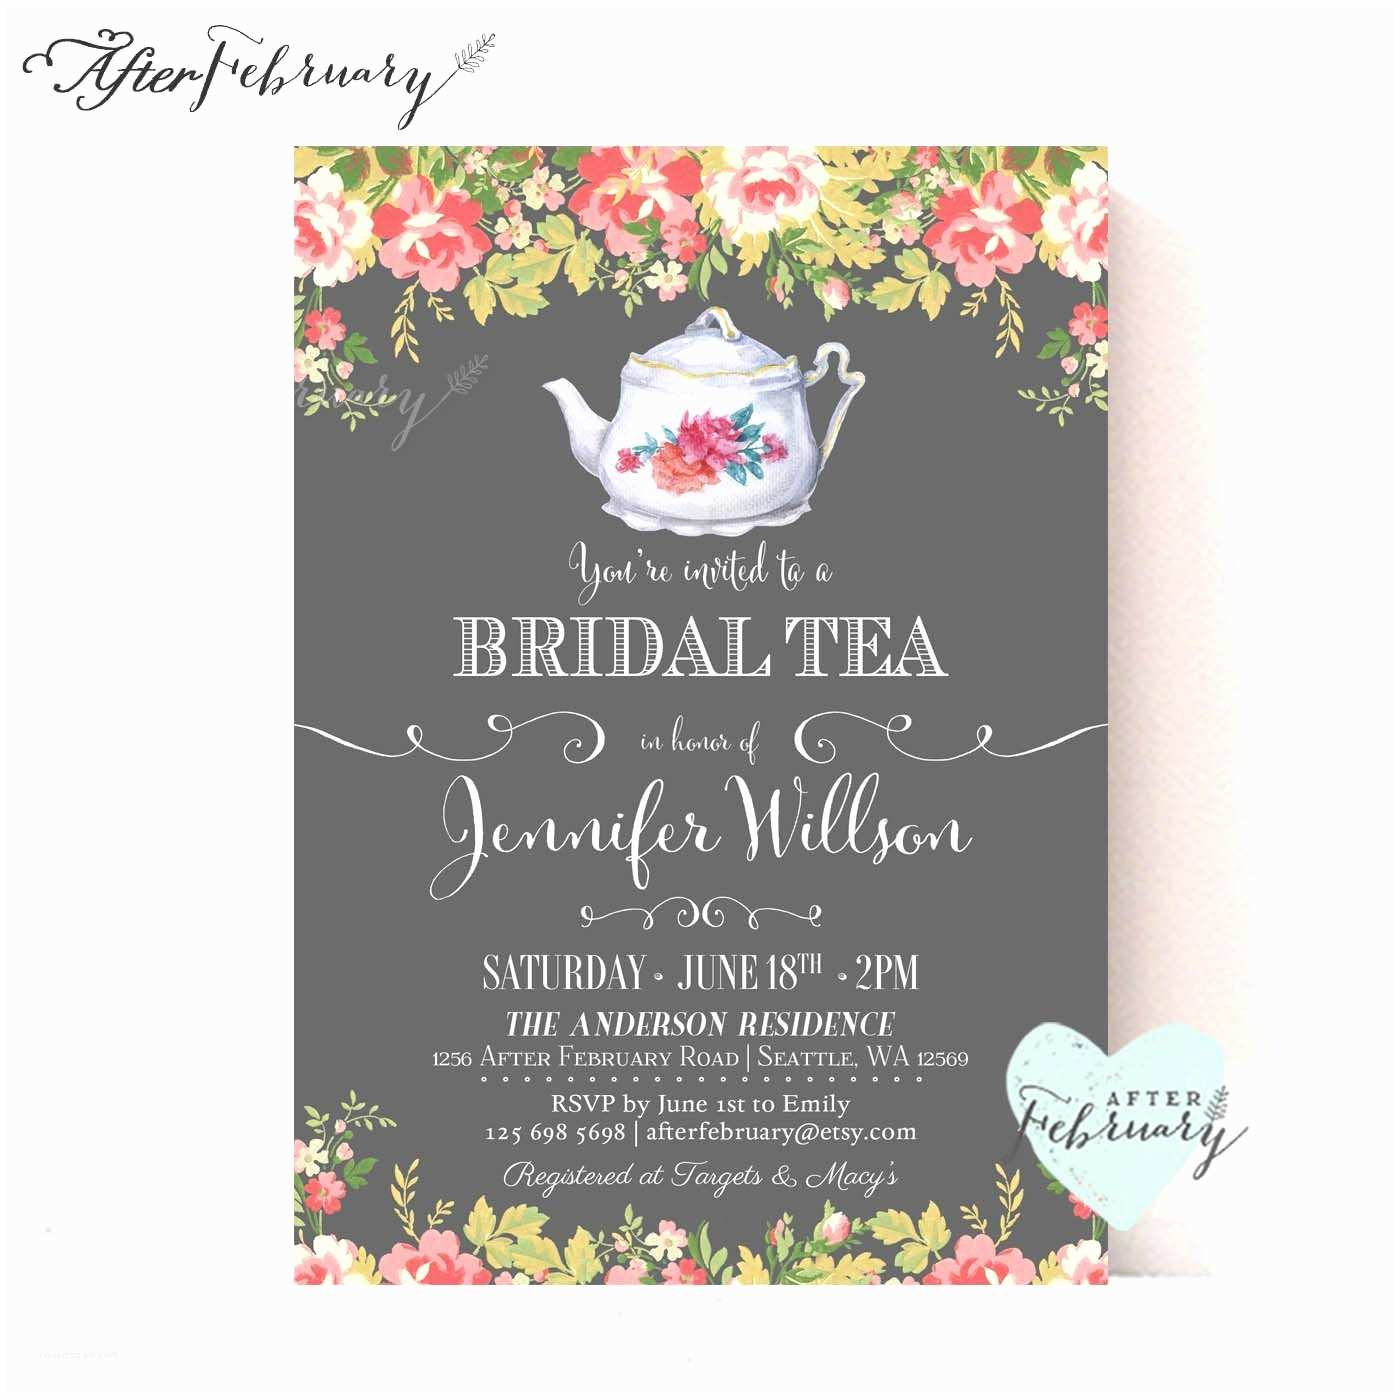 Free Bridal Shower Invitations Bridal Shower Invite Bridal Shower Invite Wording Card